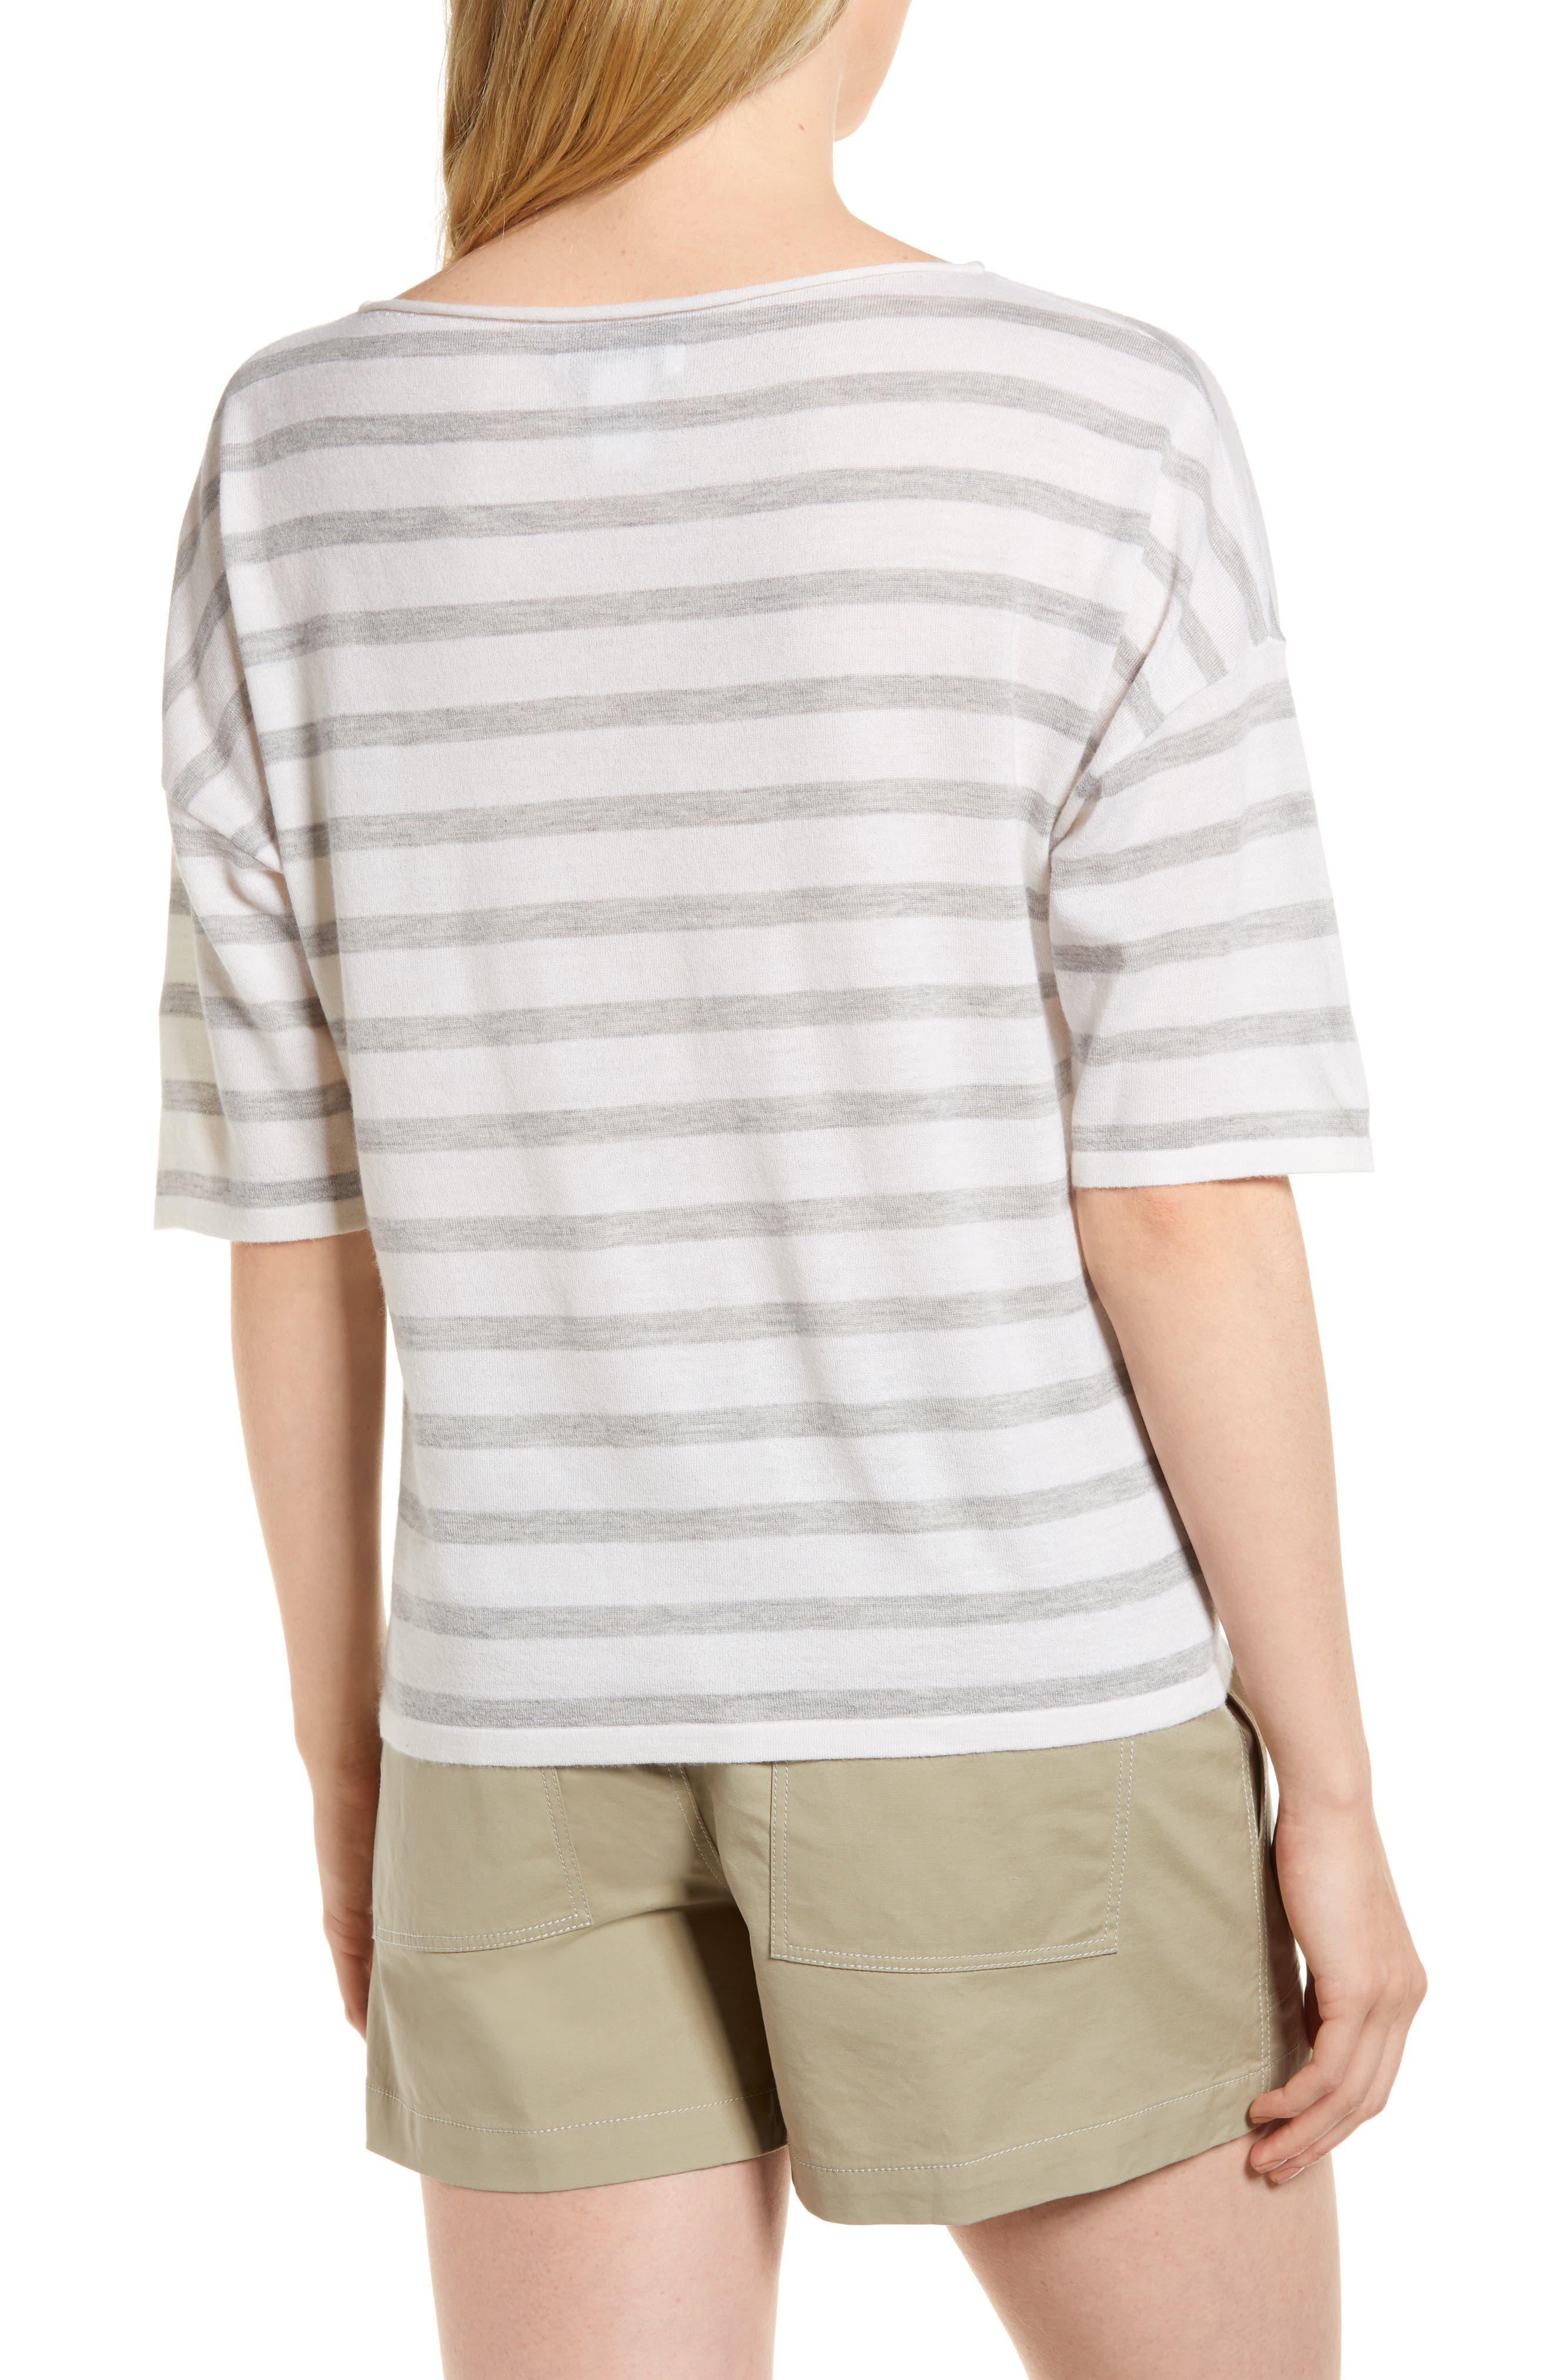 Stripe Cashmere Sweater,                             Alternate thumbnail 2, color,                             Ivory- Grey Heather Stripe